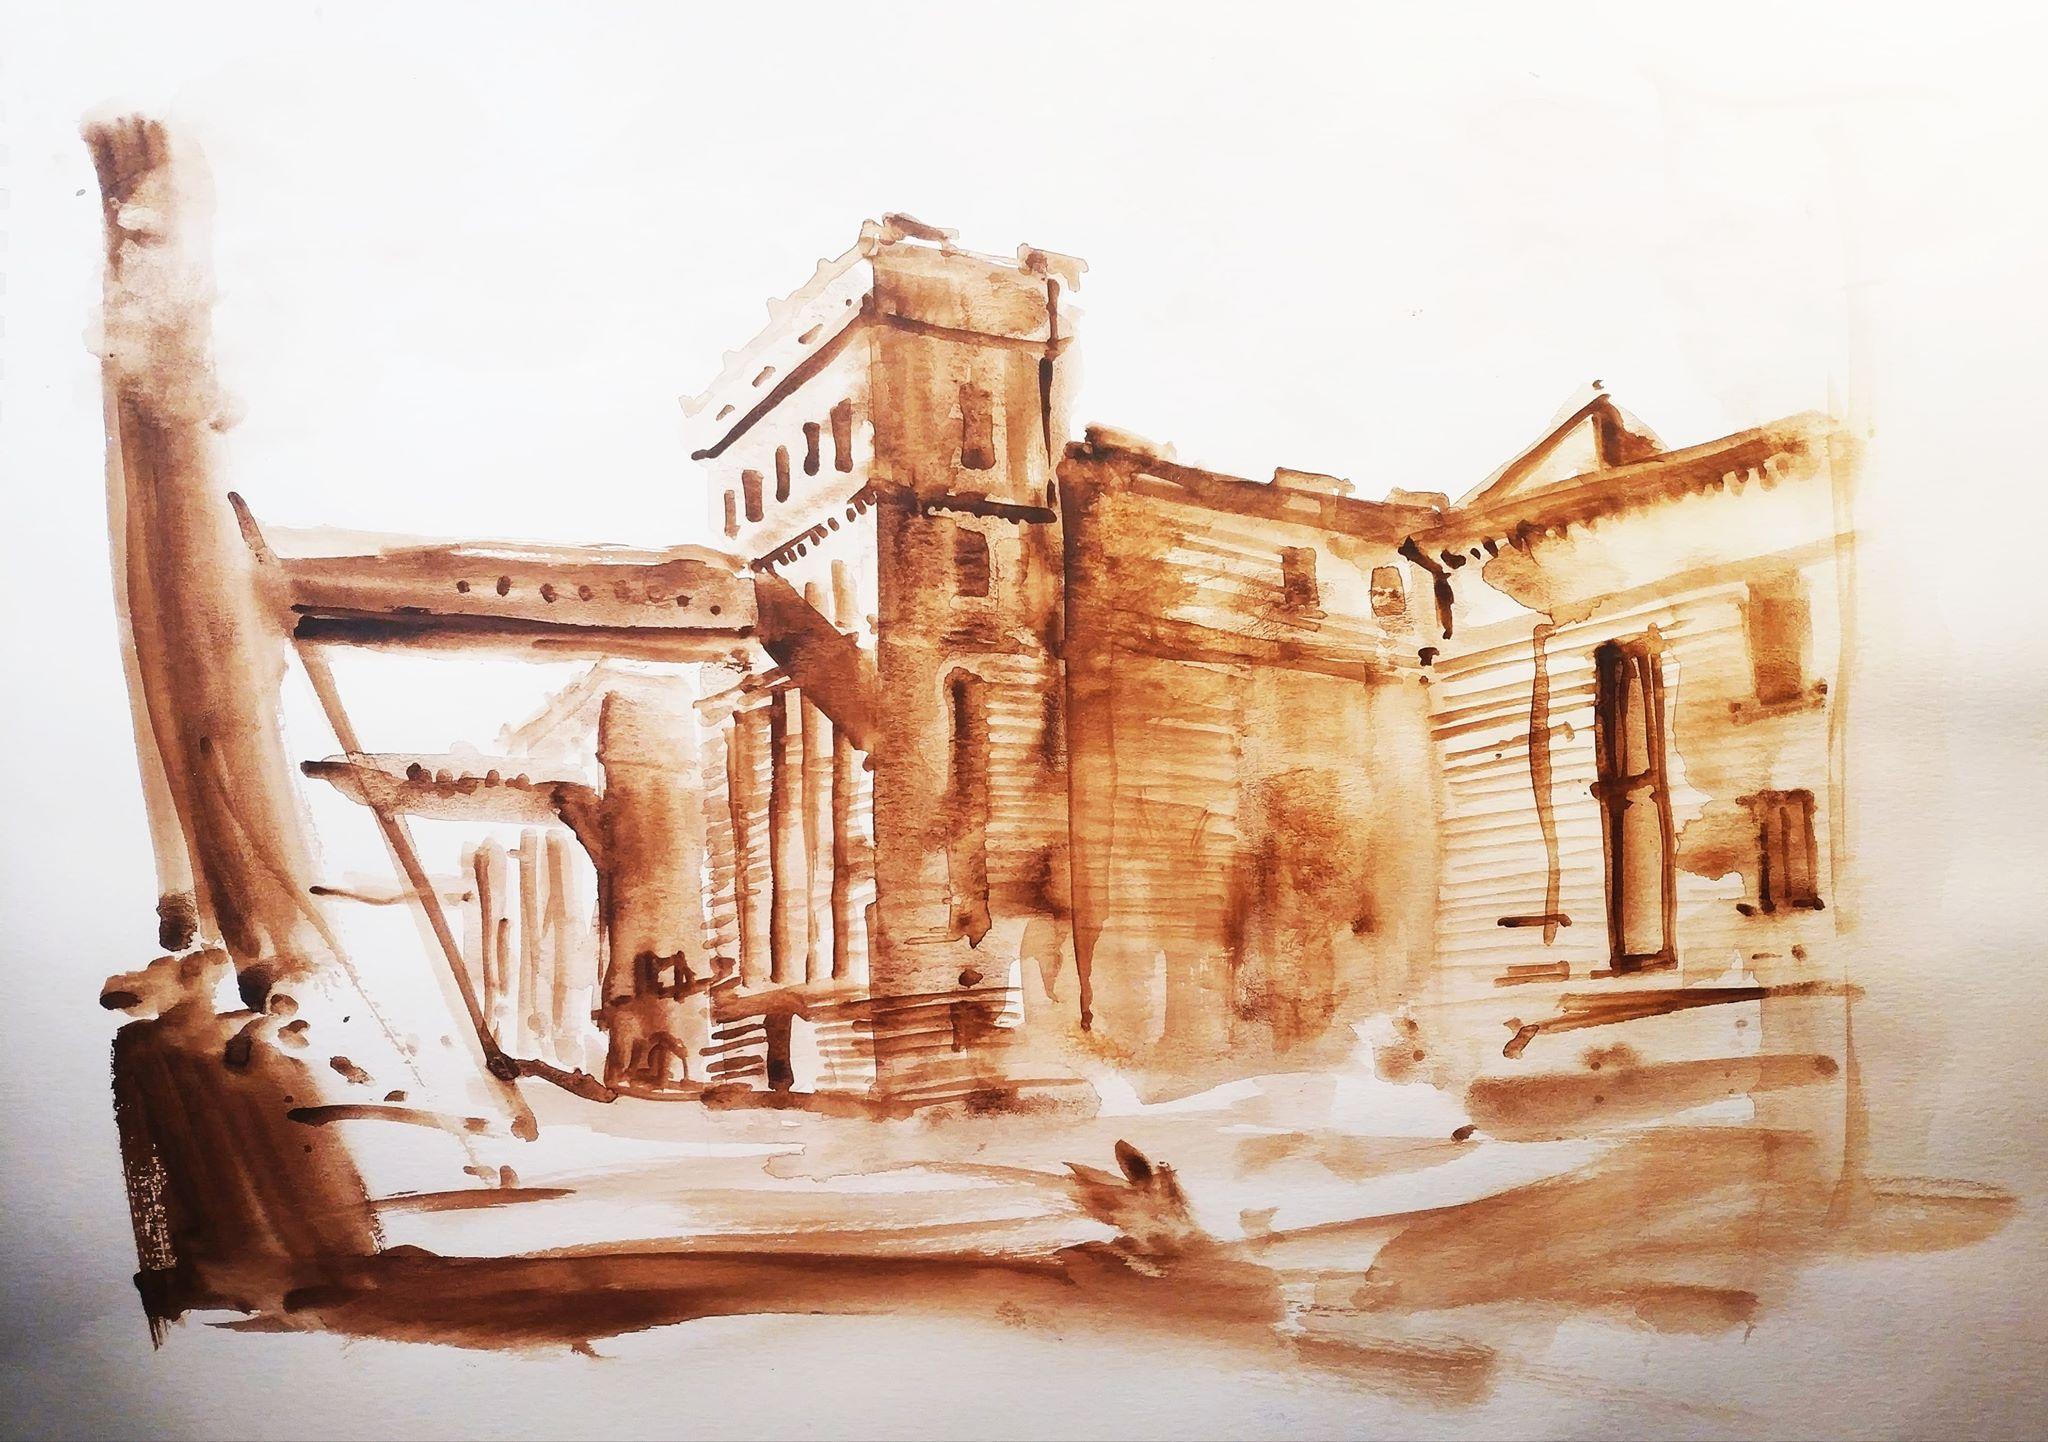 Anghel Saligny Silos, 29x42cm watercolour, 150€